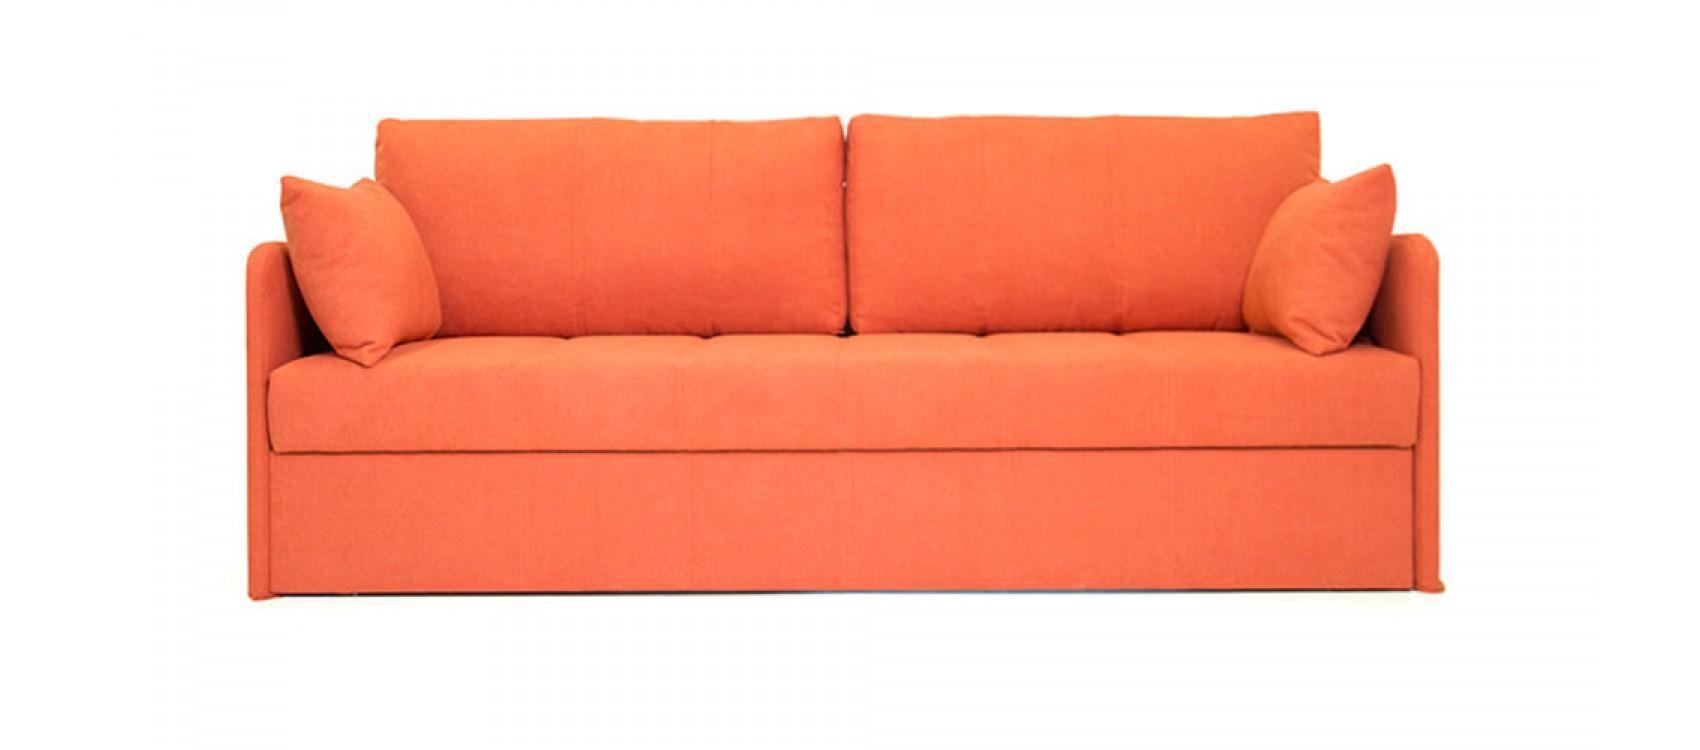 Sofa JOY foto 1